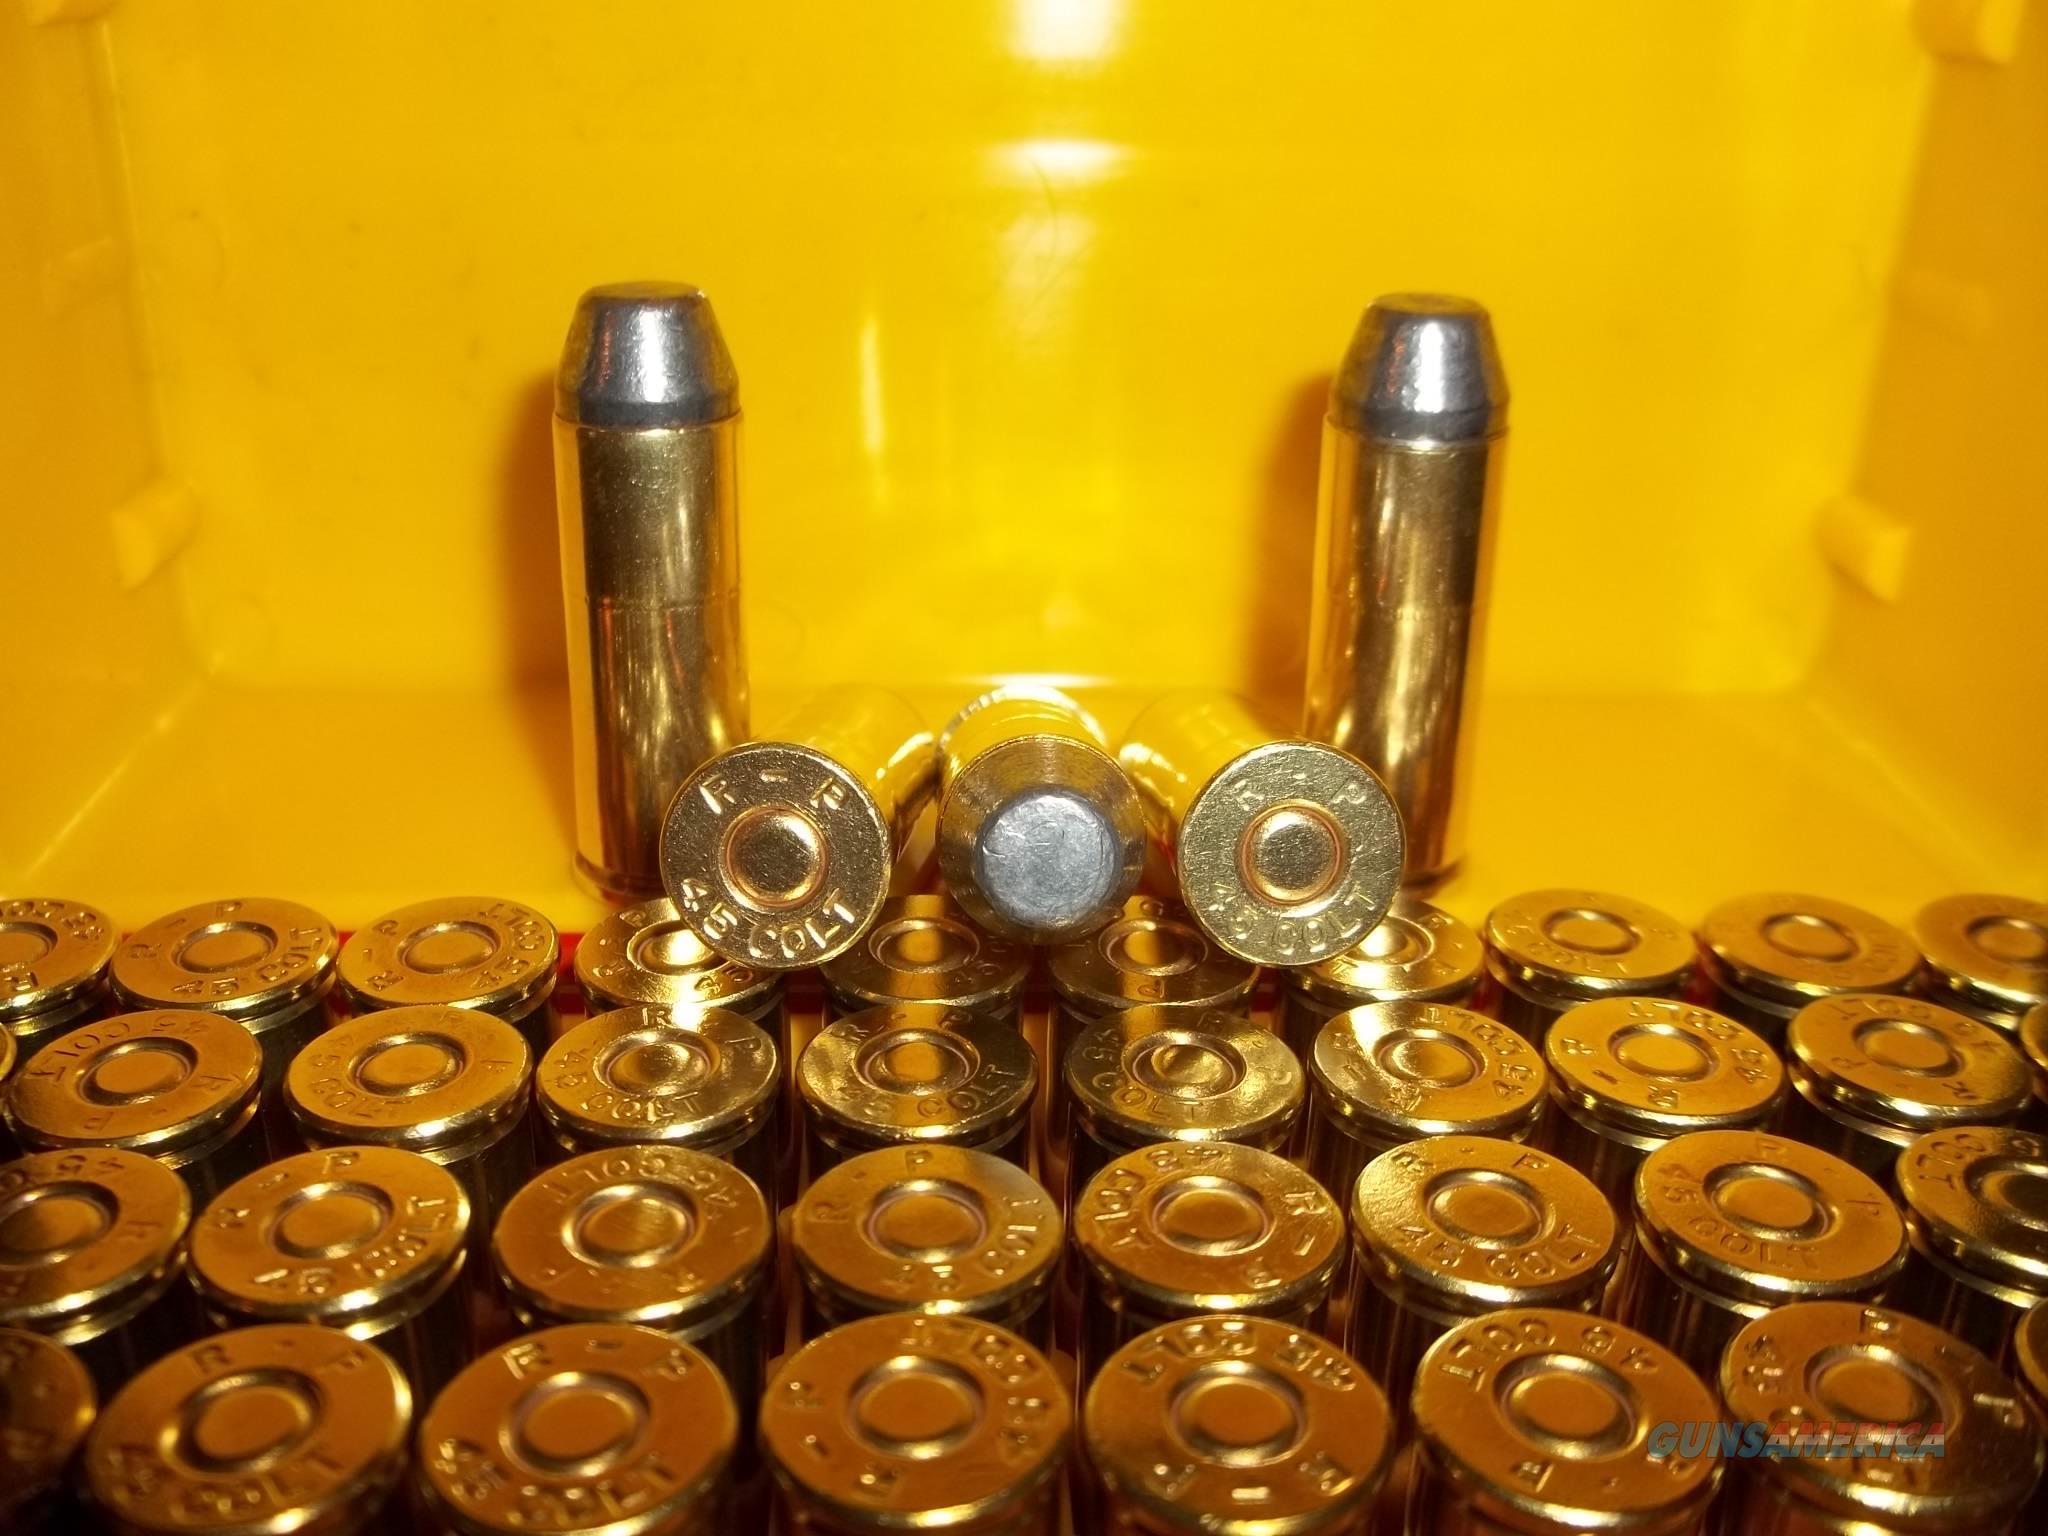 45 Colt Ammo.  Non-Guns > Ammunition